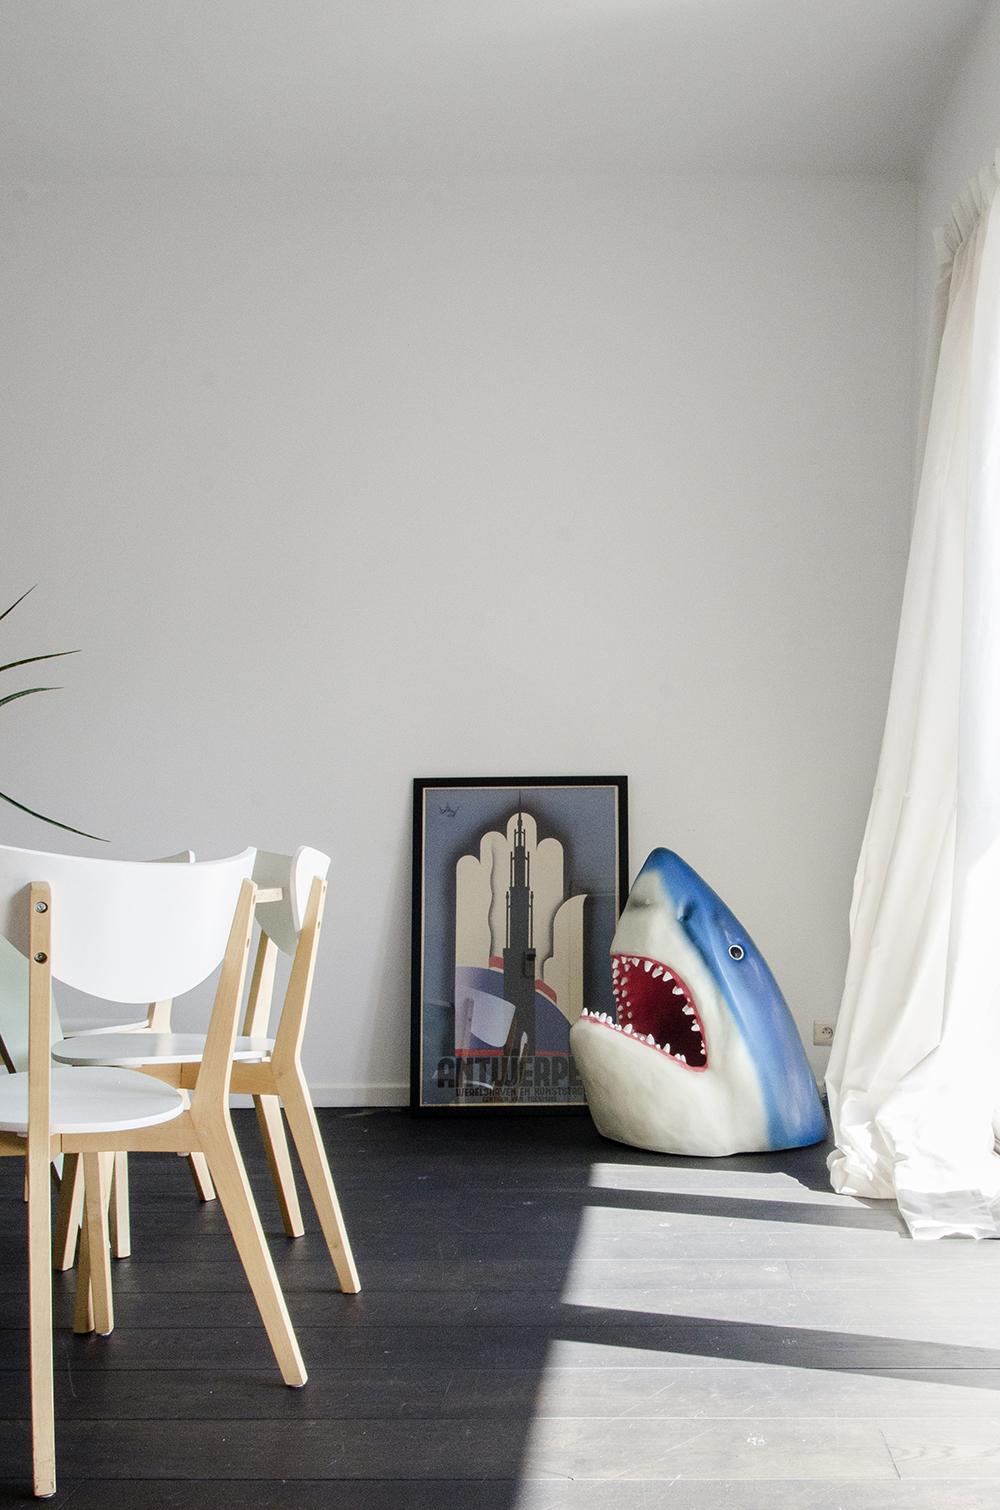 Katrin & Maarten's Dinosaur and Shark Sanctuary // Home tour of a quirky, bright loft in Antwerp Belgium